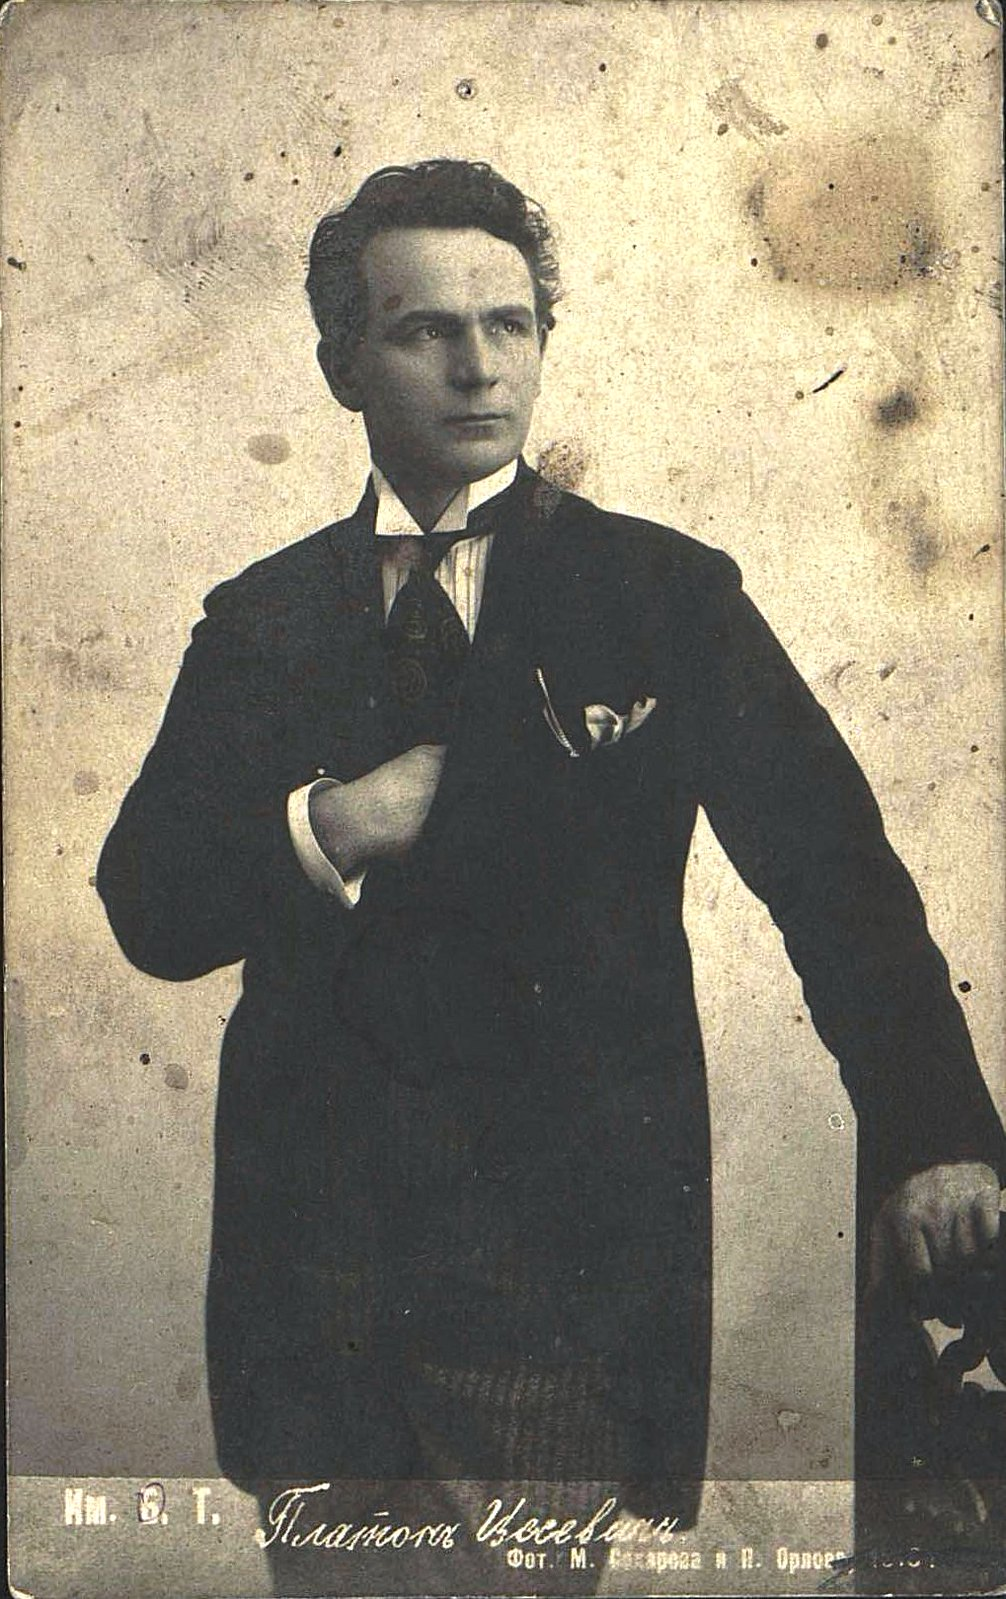 Цесевич Платон Иванович, артист Одесского оперного театра. 1915-1916 гг.